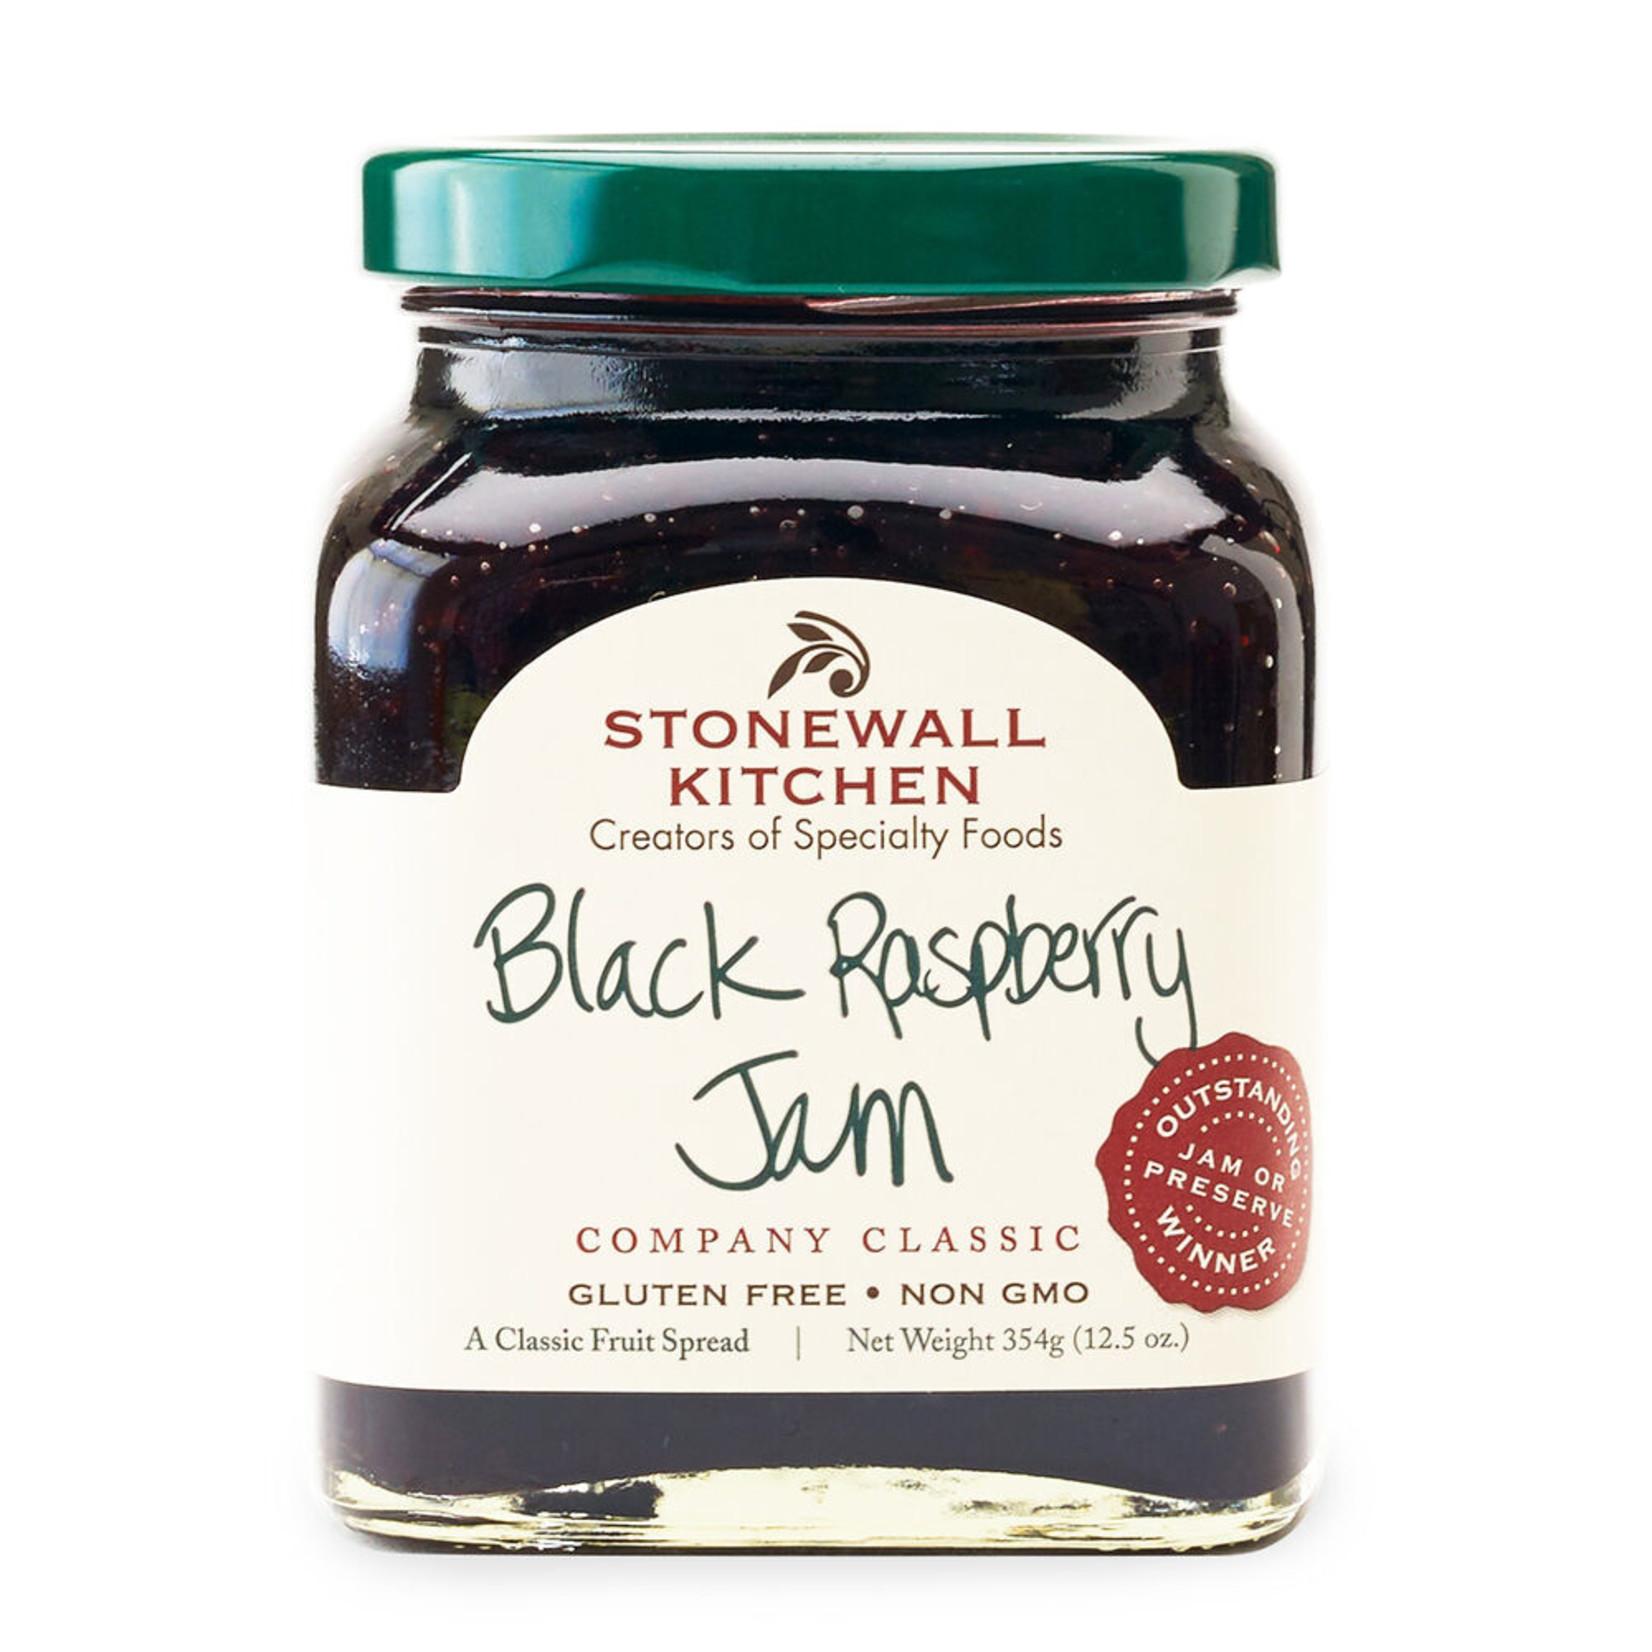 Stonewall Kitchen BLACK RASPBERRY JAM